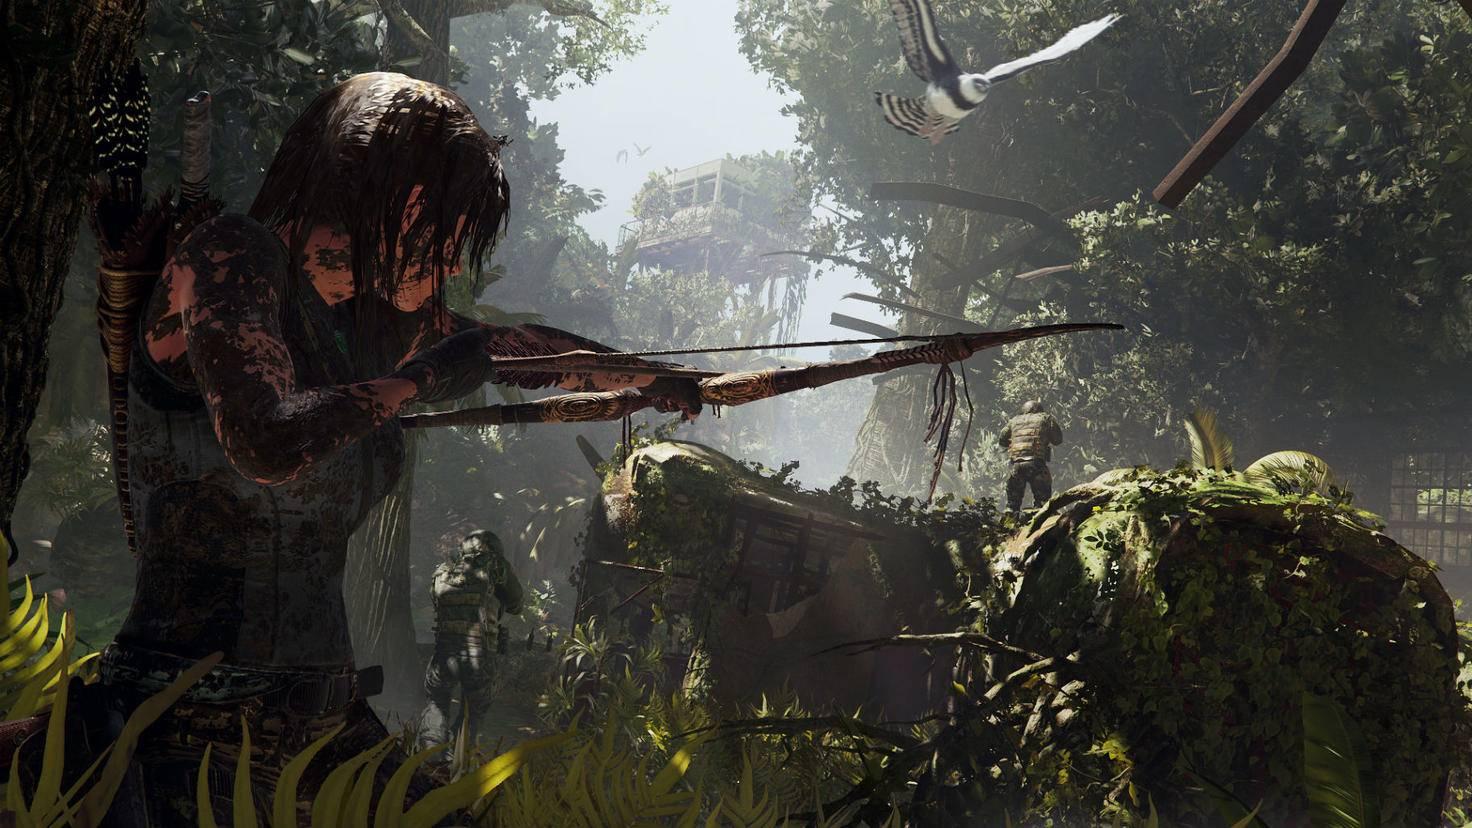 shadow-of-the-tomb-raider-screenshot-05